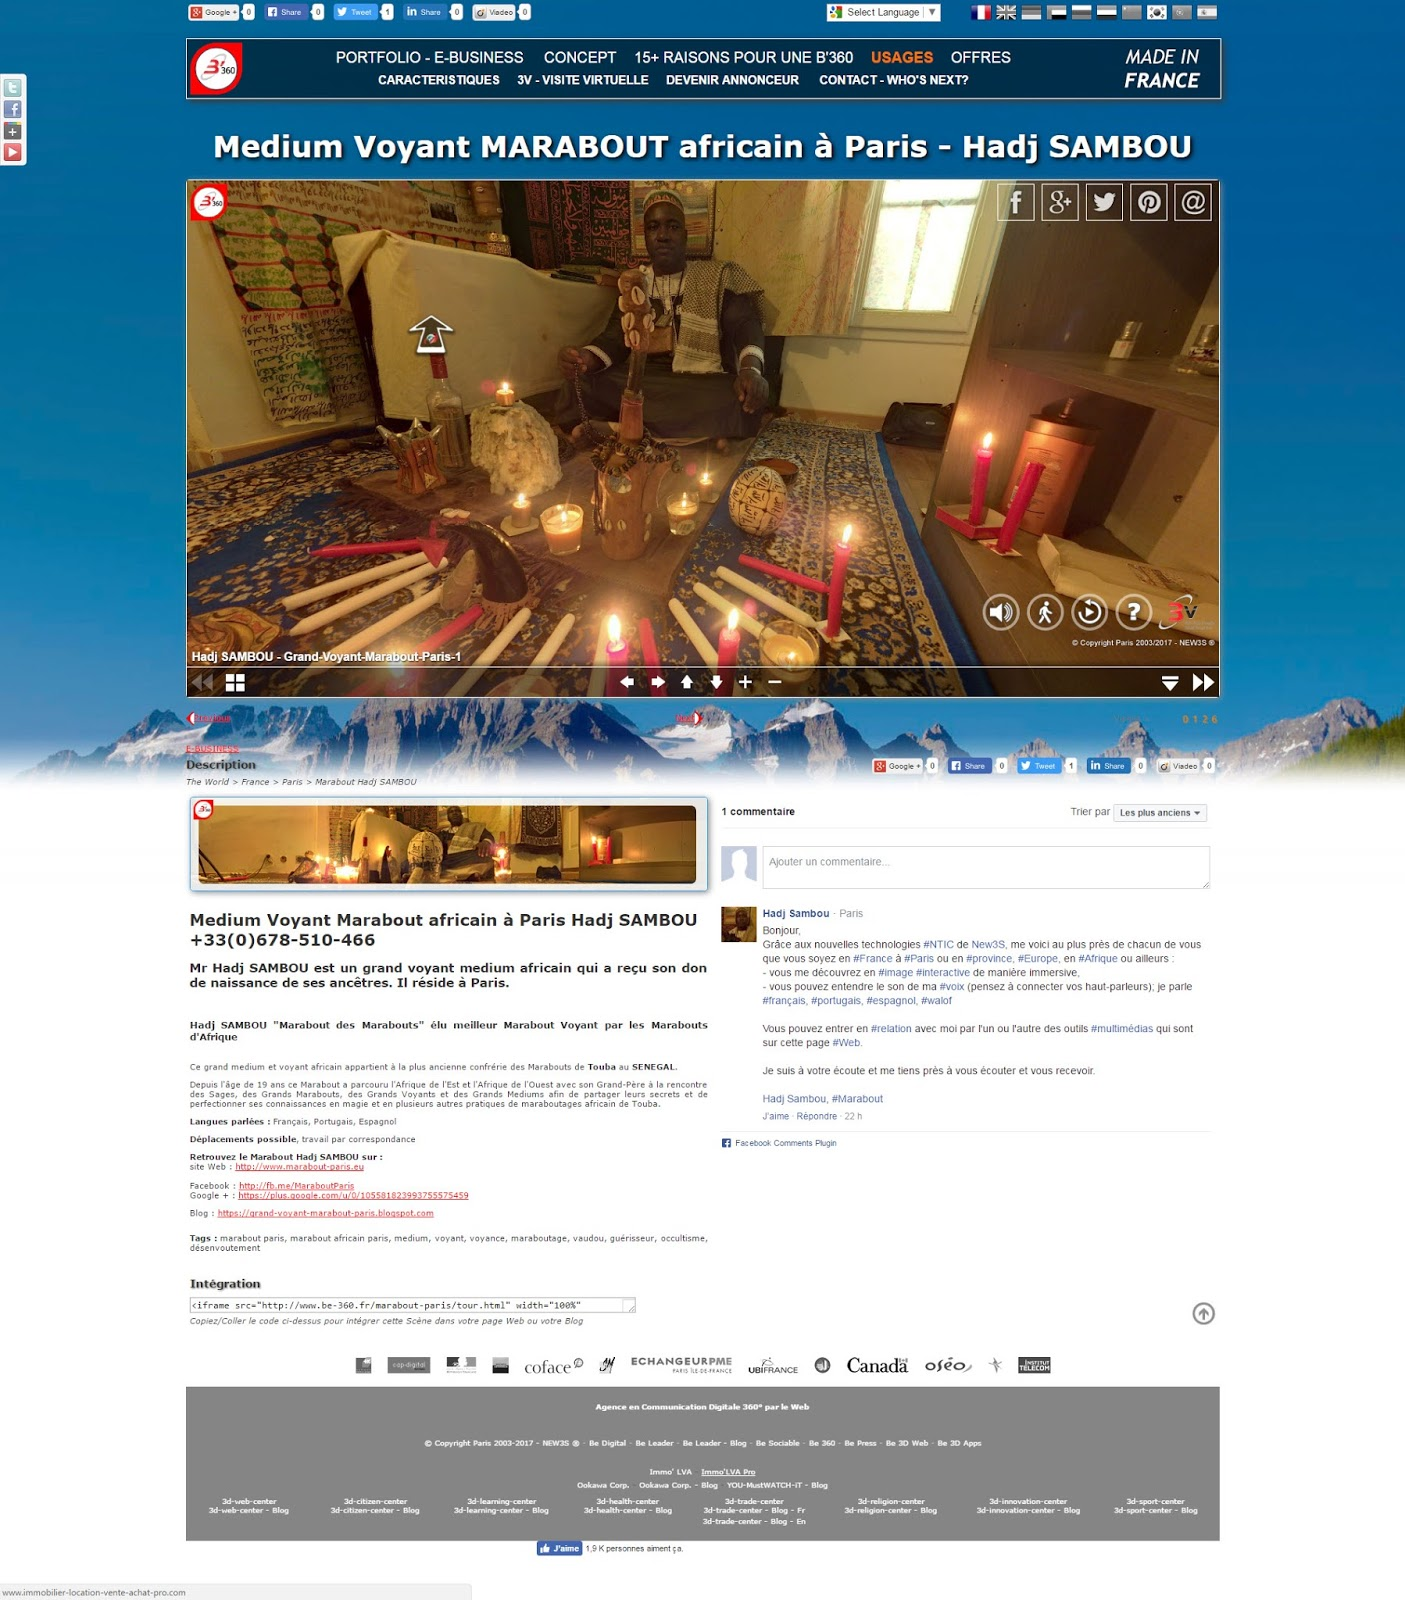 Hadj SAMBOU Grand Medium Voyant Marabout africain à Paris